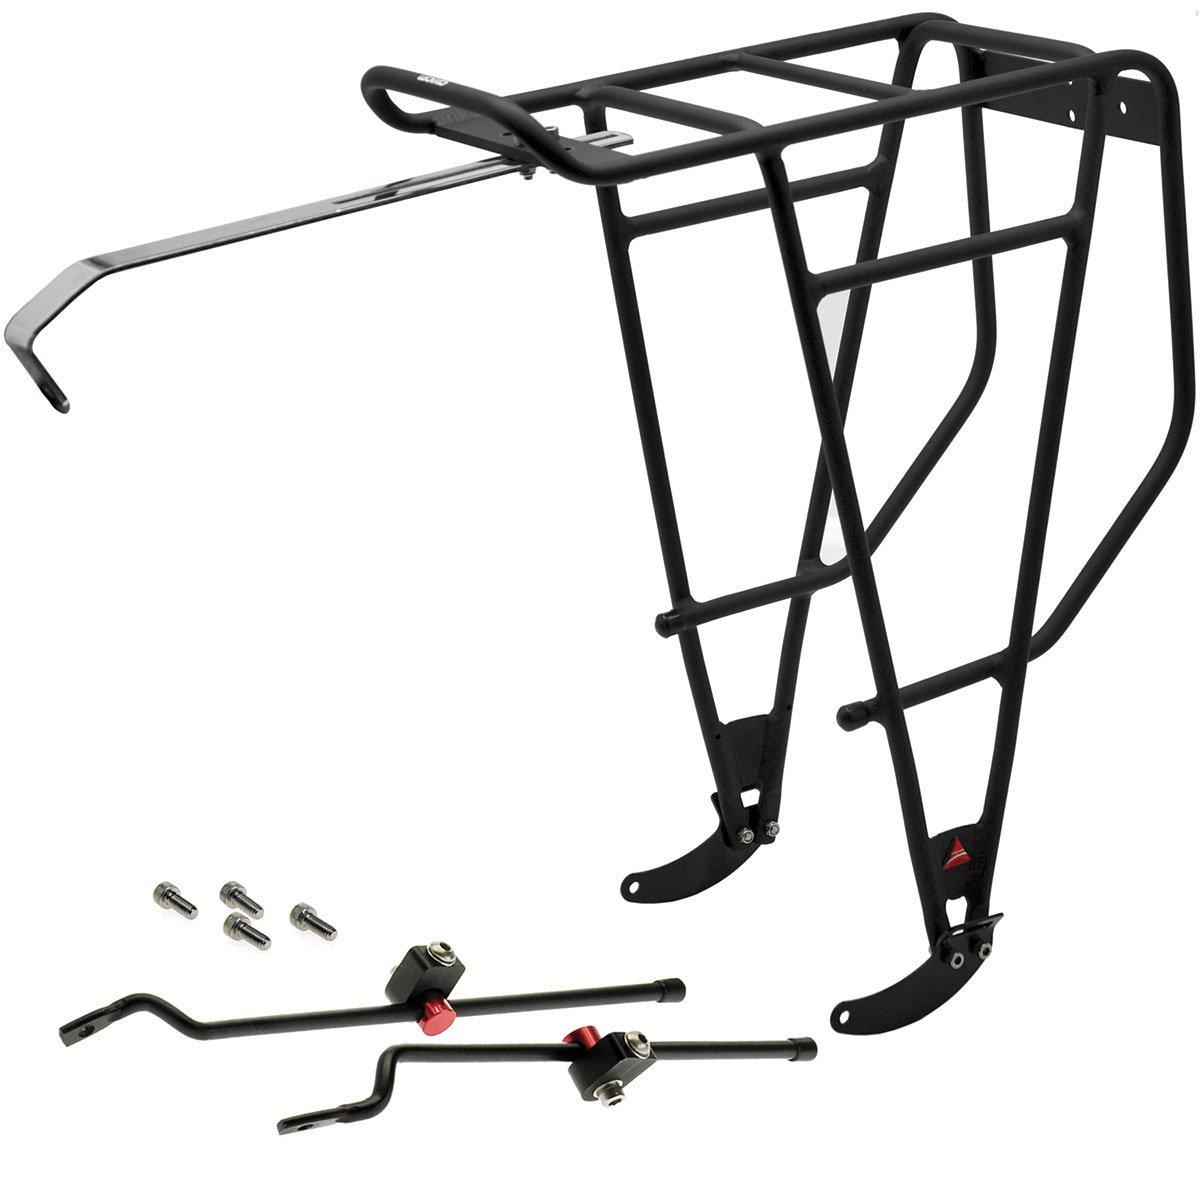 Axiom Fatliner Bike Rack Sports Outdoors